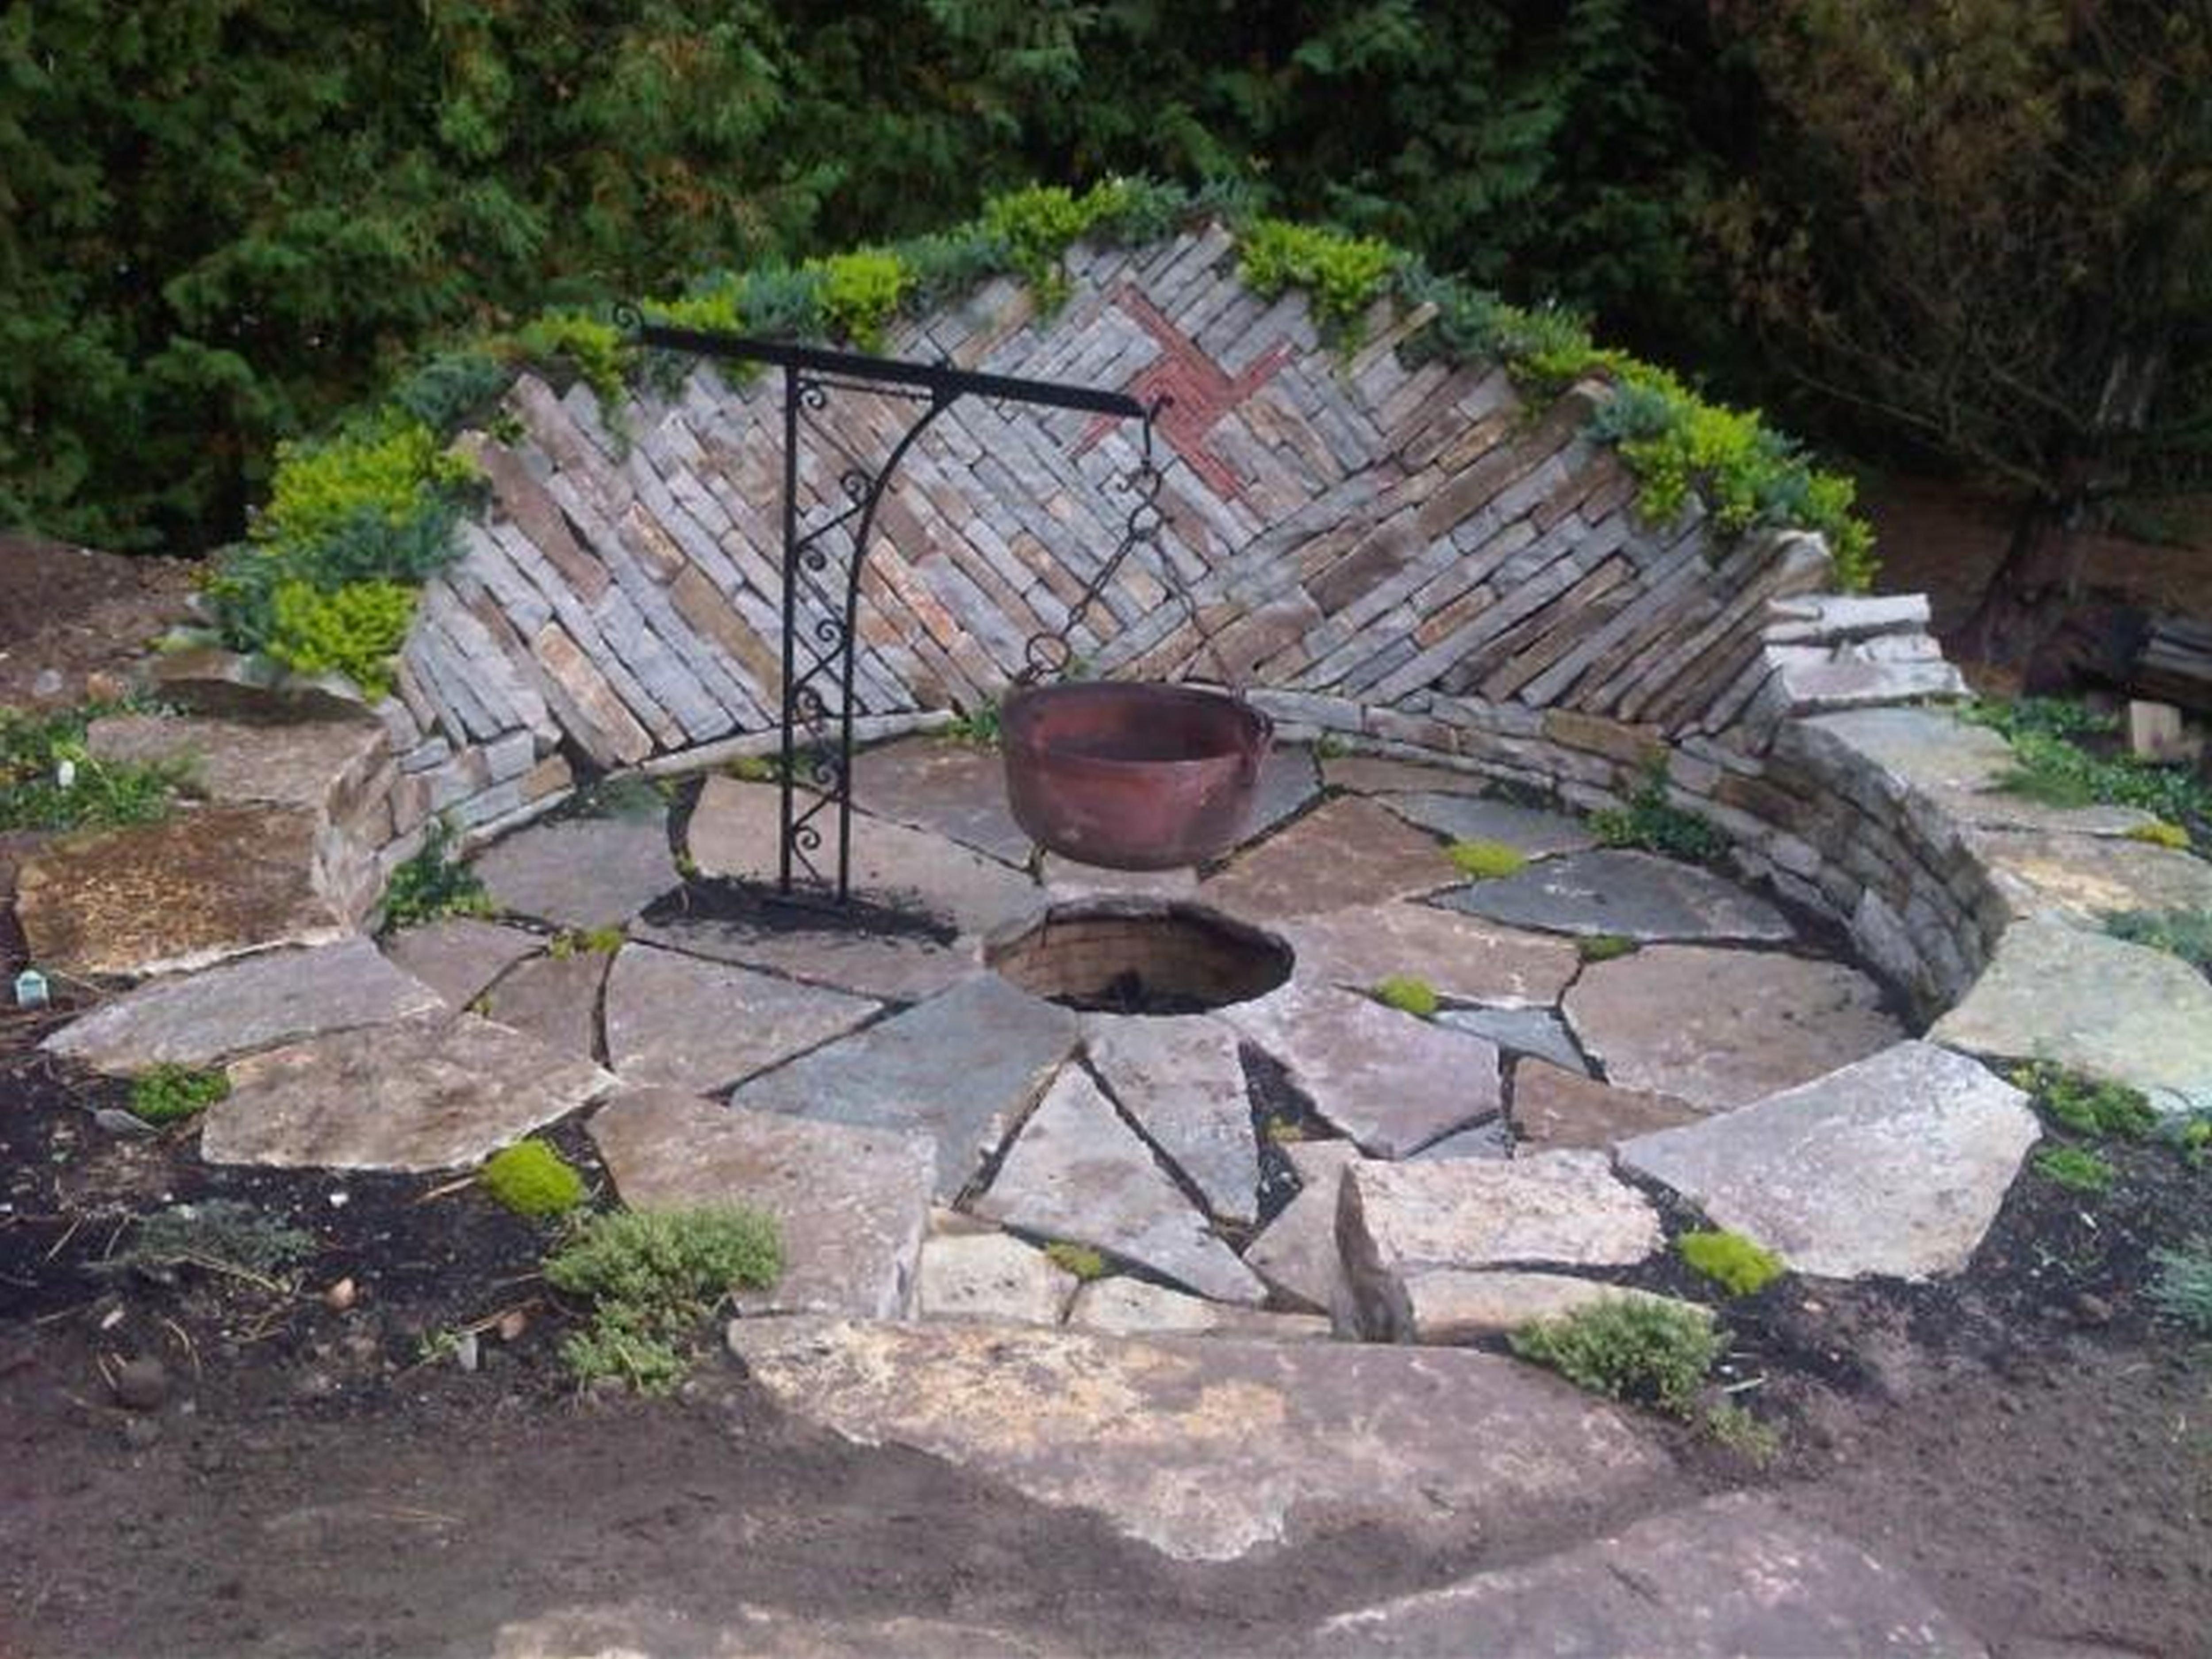 10 Most Popular Cheap Outdoor Fire Pit Ideas fire pit and outdoor fireplace ideas diy network made inspirations 2021